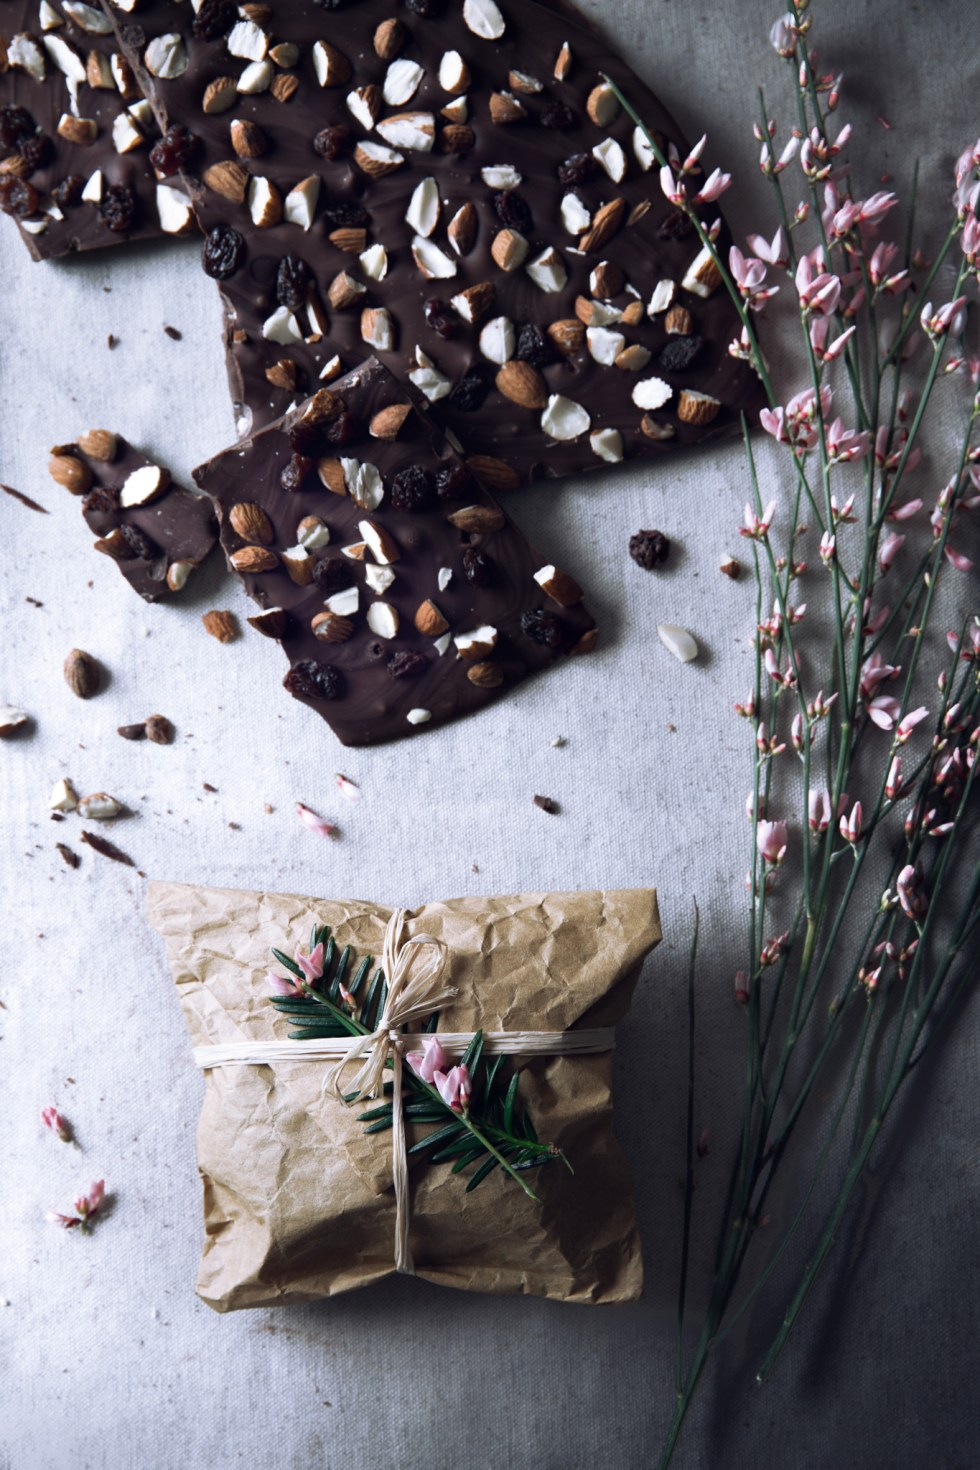 Chocolats personnalisés à offrir | www.lafaimestproche.com